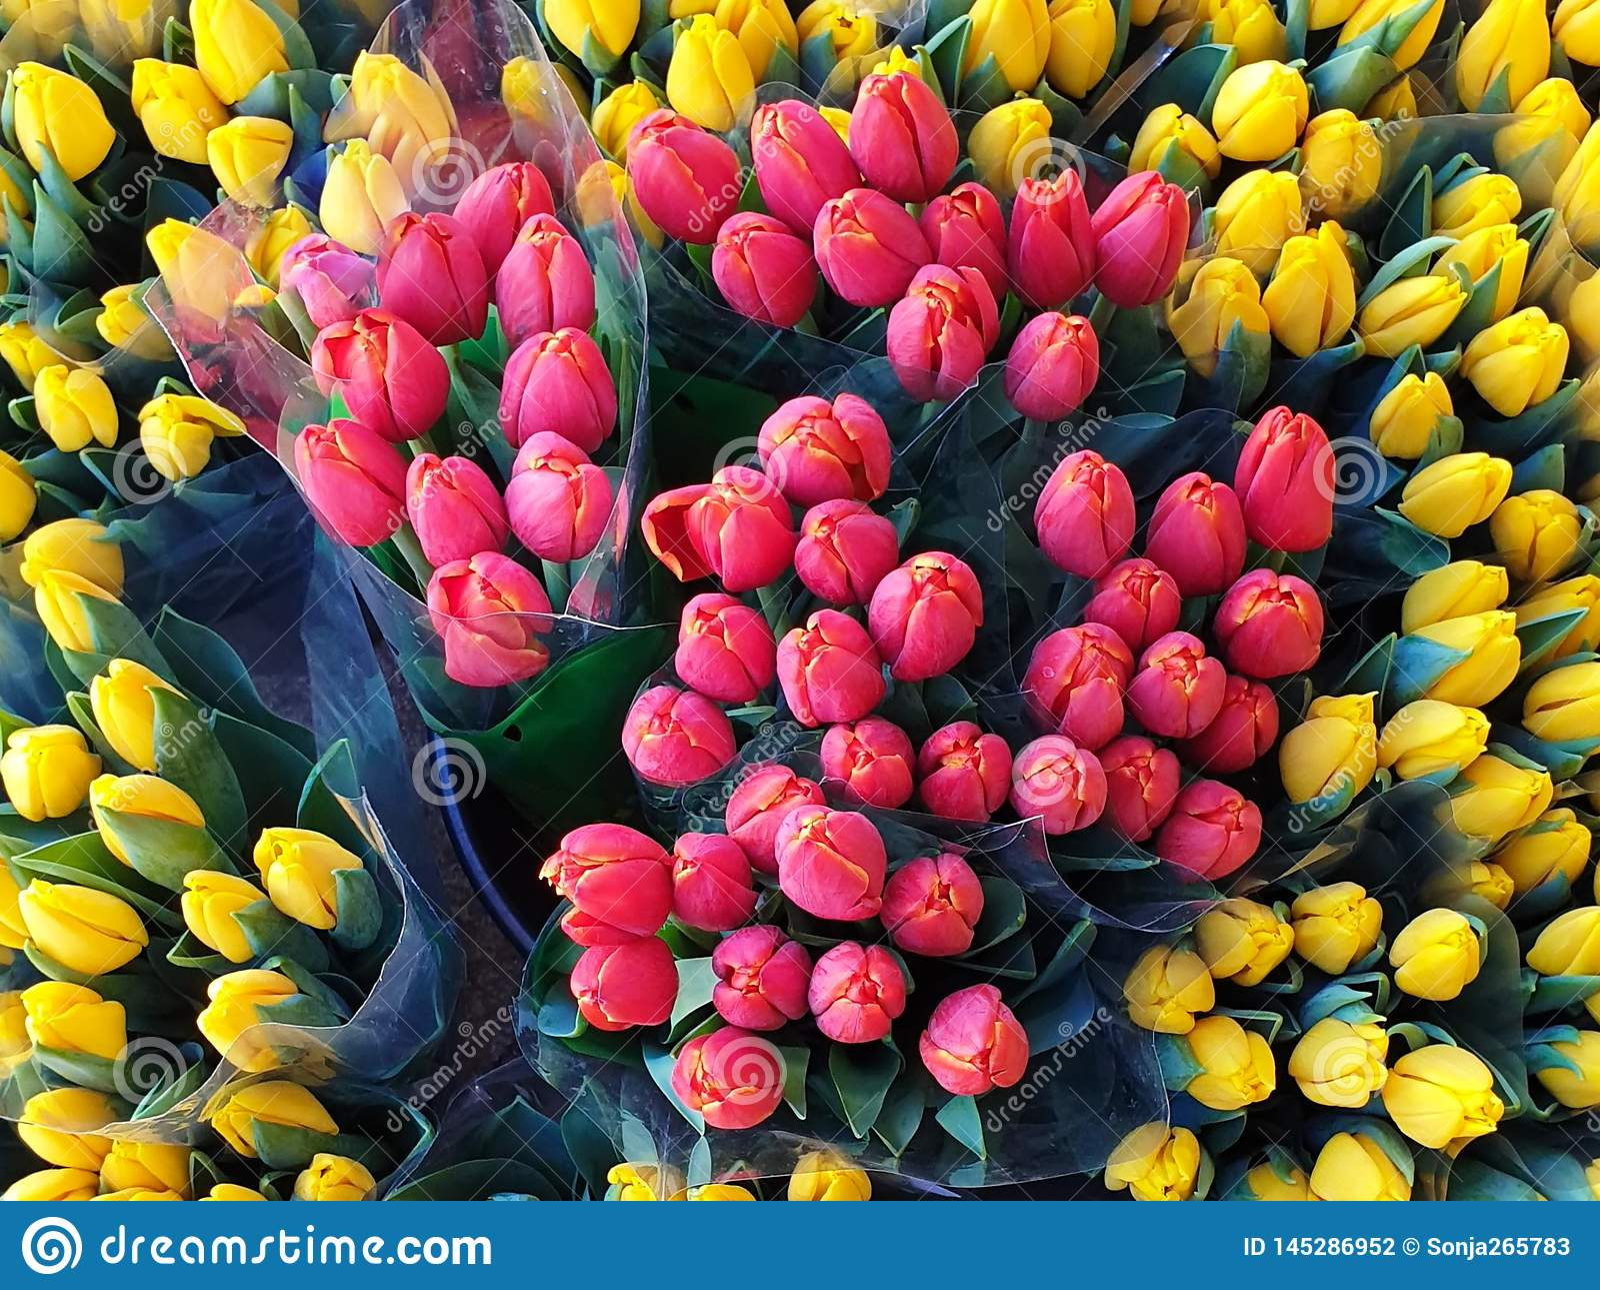 Summer Flowers Market Red Yellow Tulip bouquet background